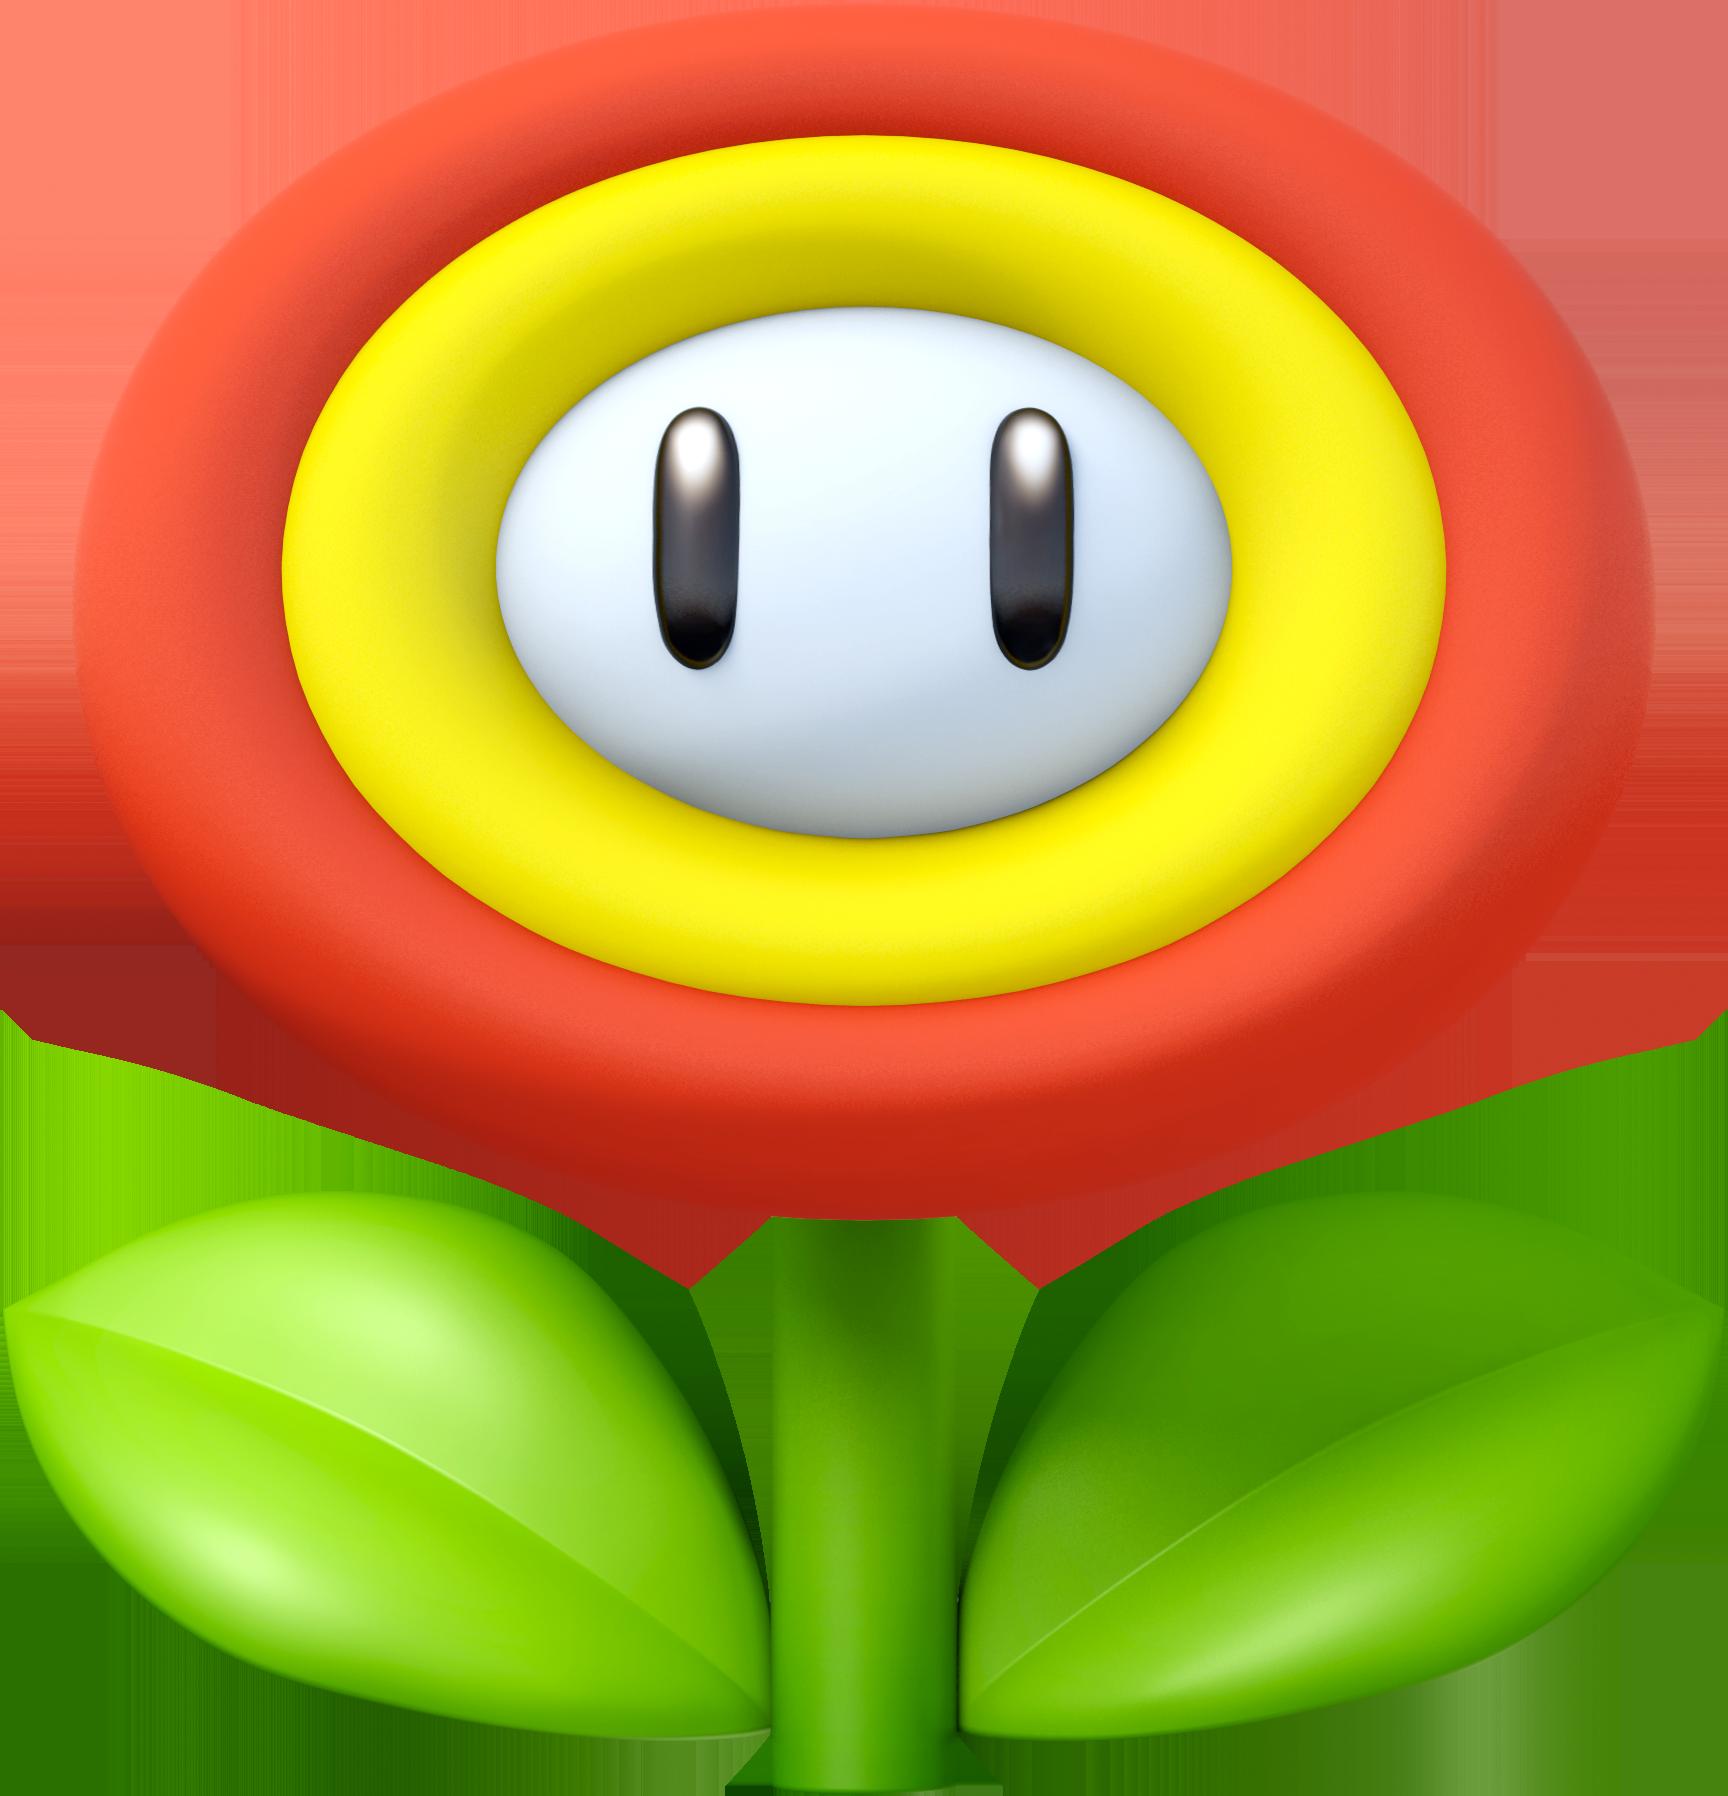 Super mario star eyes clipart clipart royalty free download Fire Flower | Nintendo | FANDOM powered by Wikia clipart royalty free download